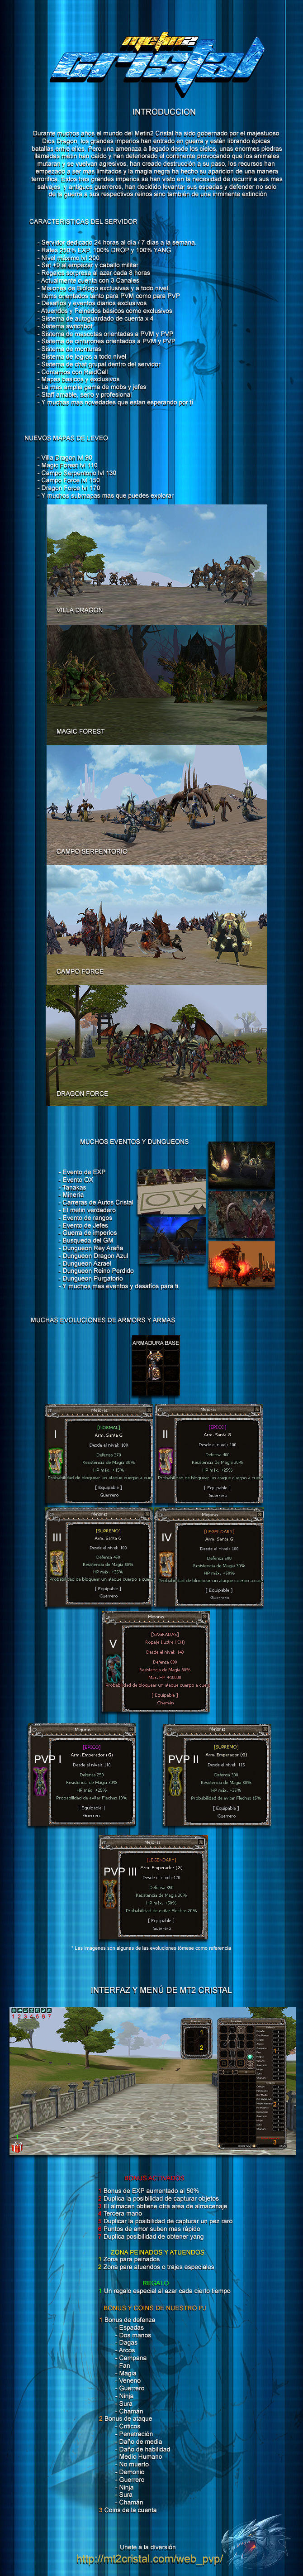 Foro gratis : Metin2Cristal - Portal JaP2g